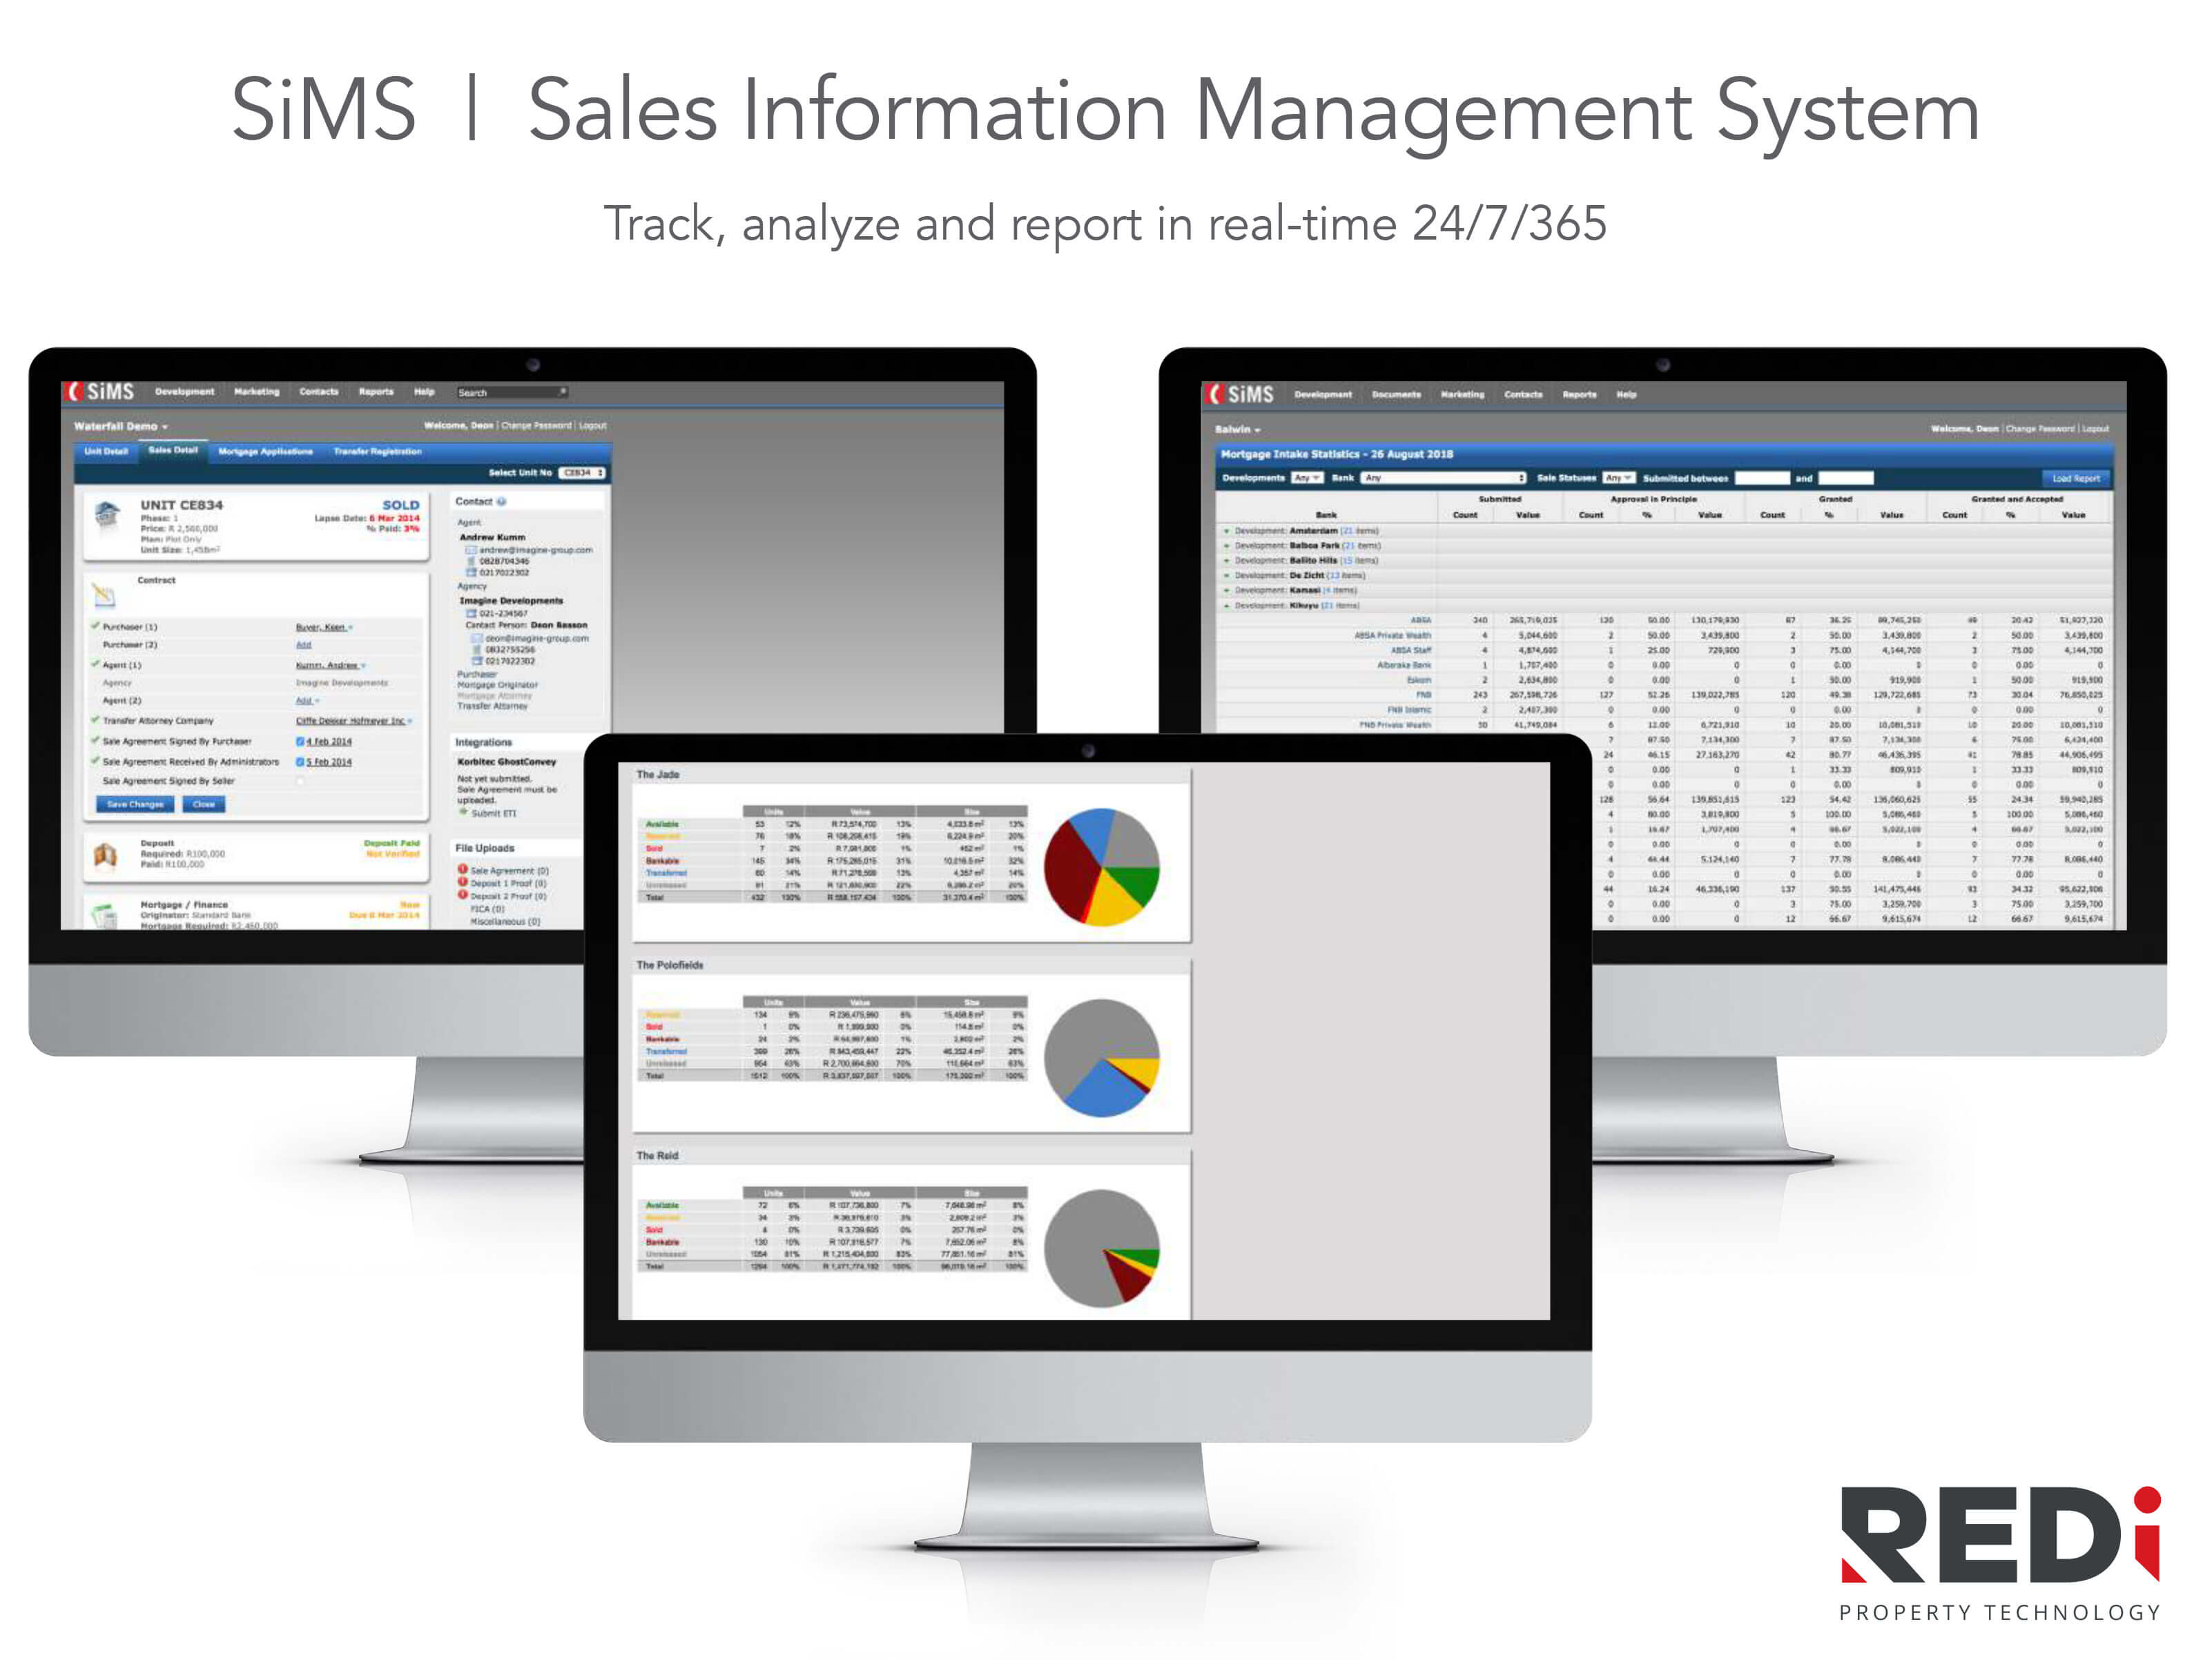 sims sales analytics - REDi Communication